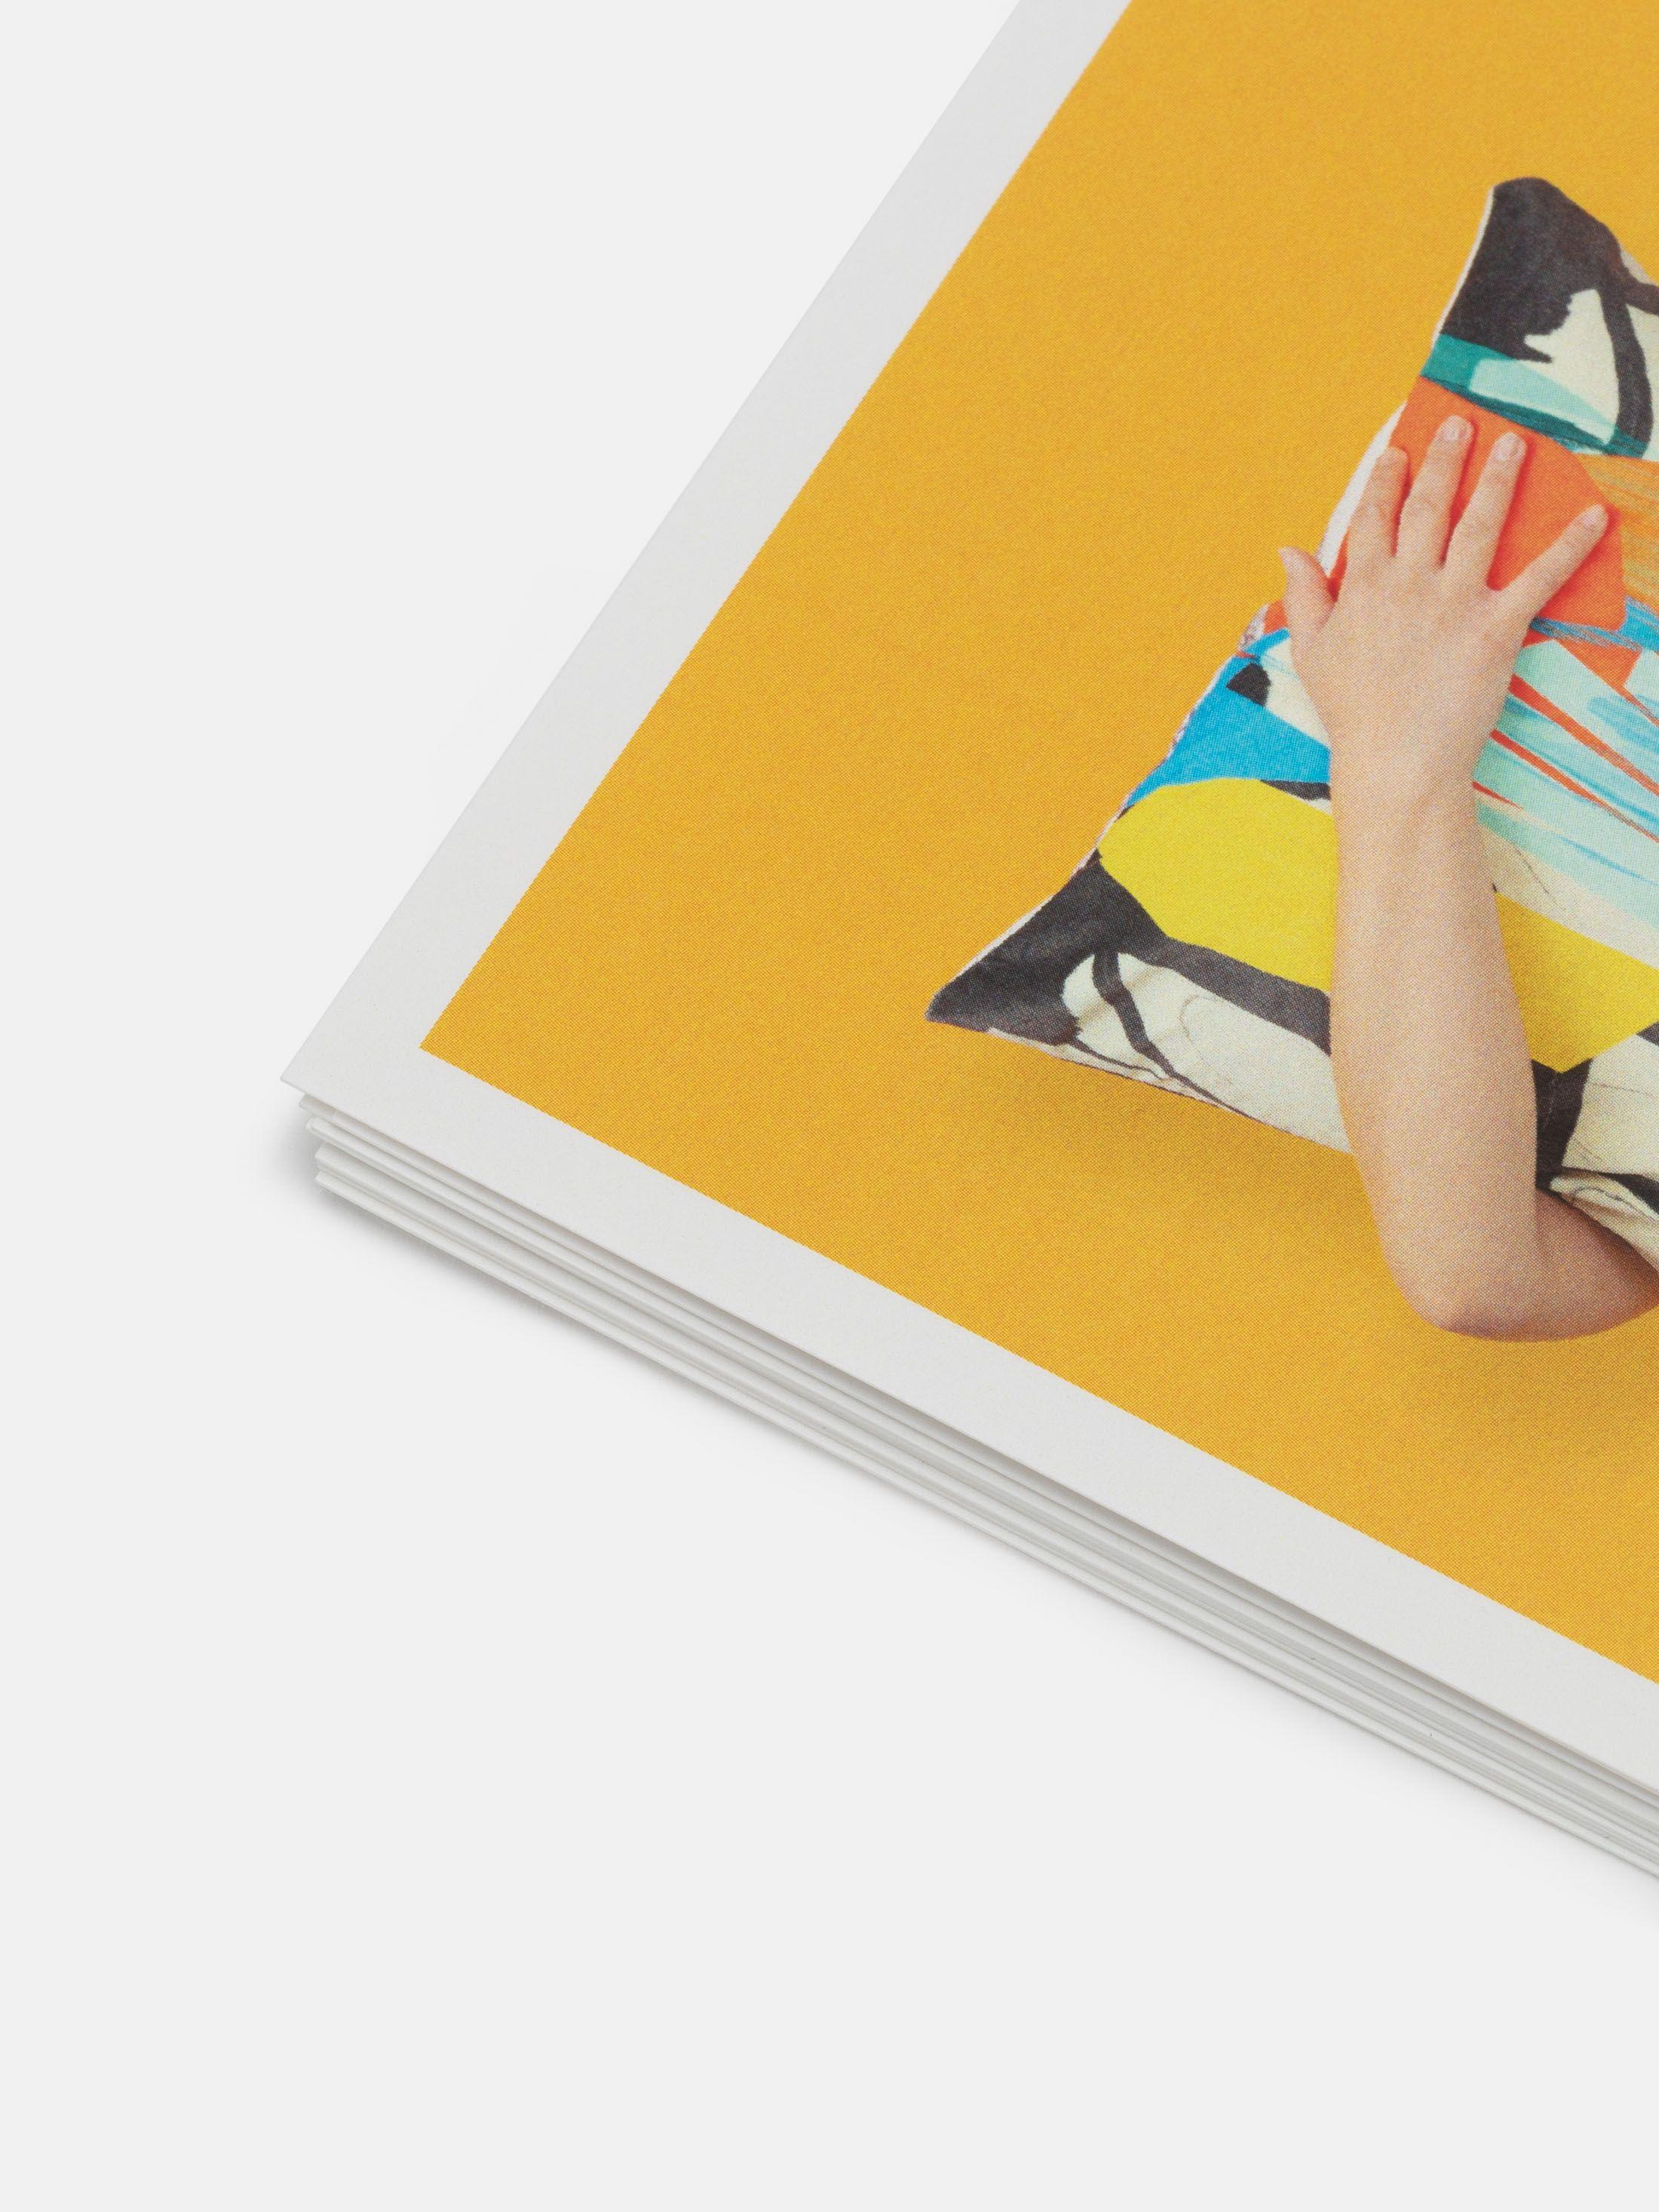 Design Your Own Instagram Prints